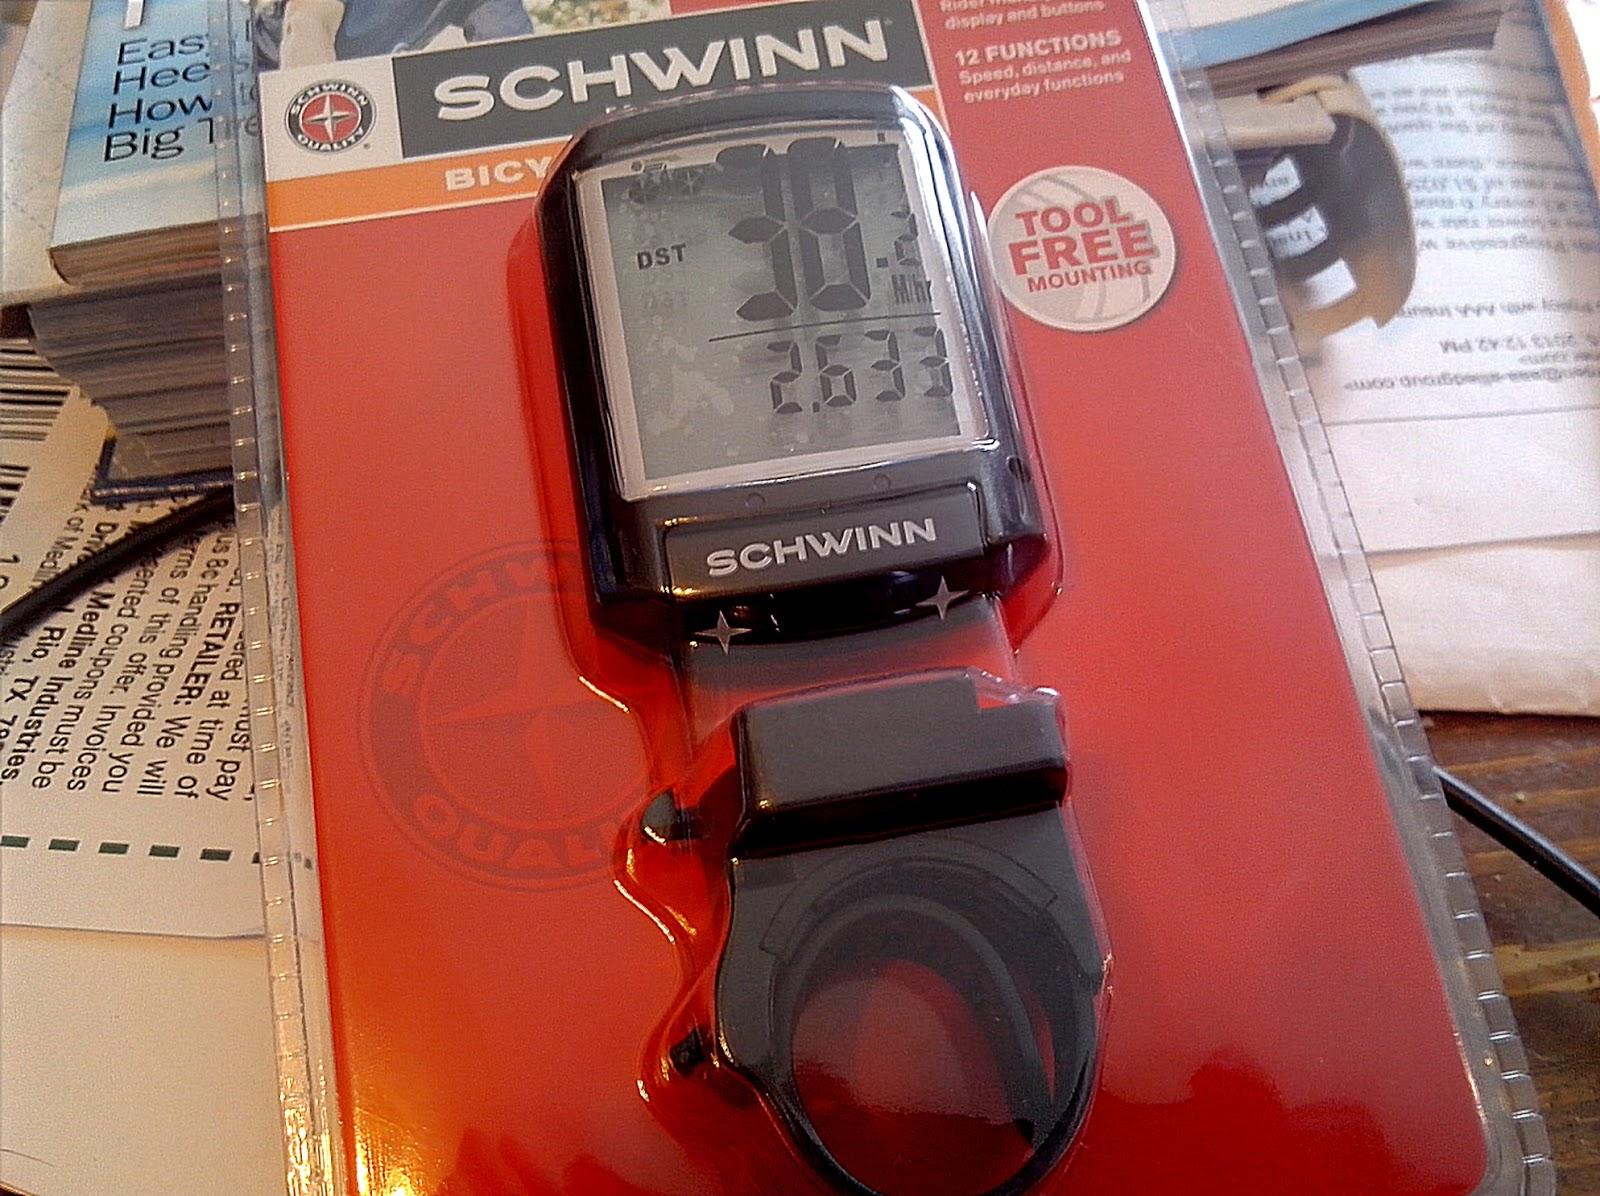 schwinn 11 function bike computer manual